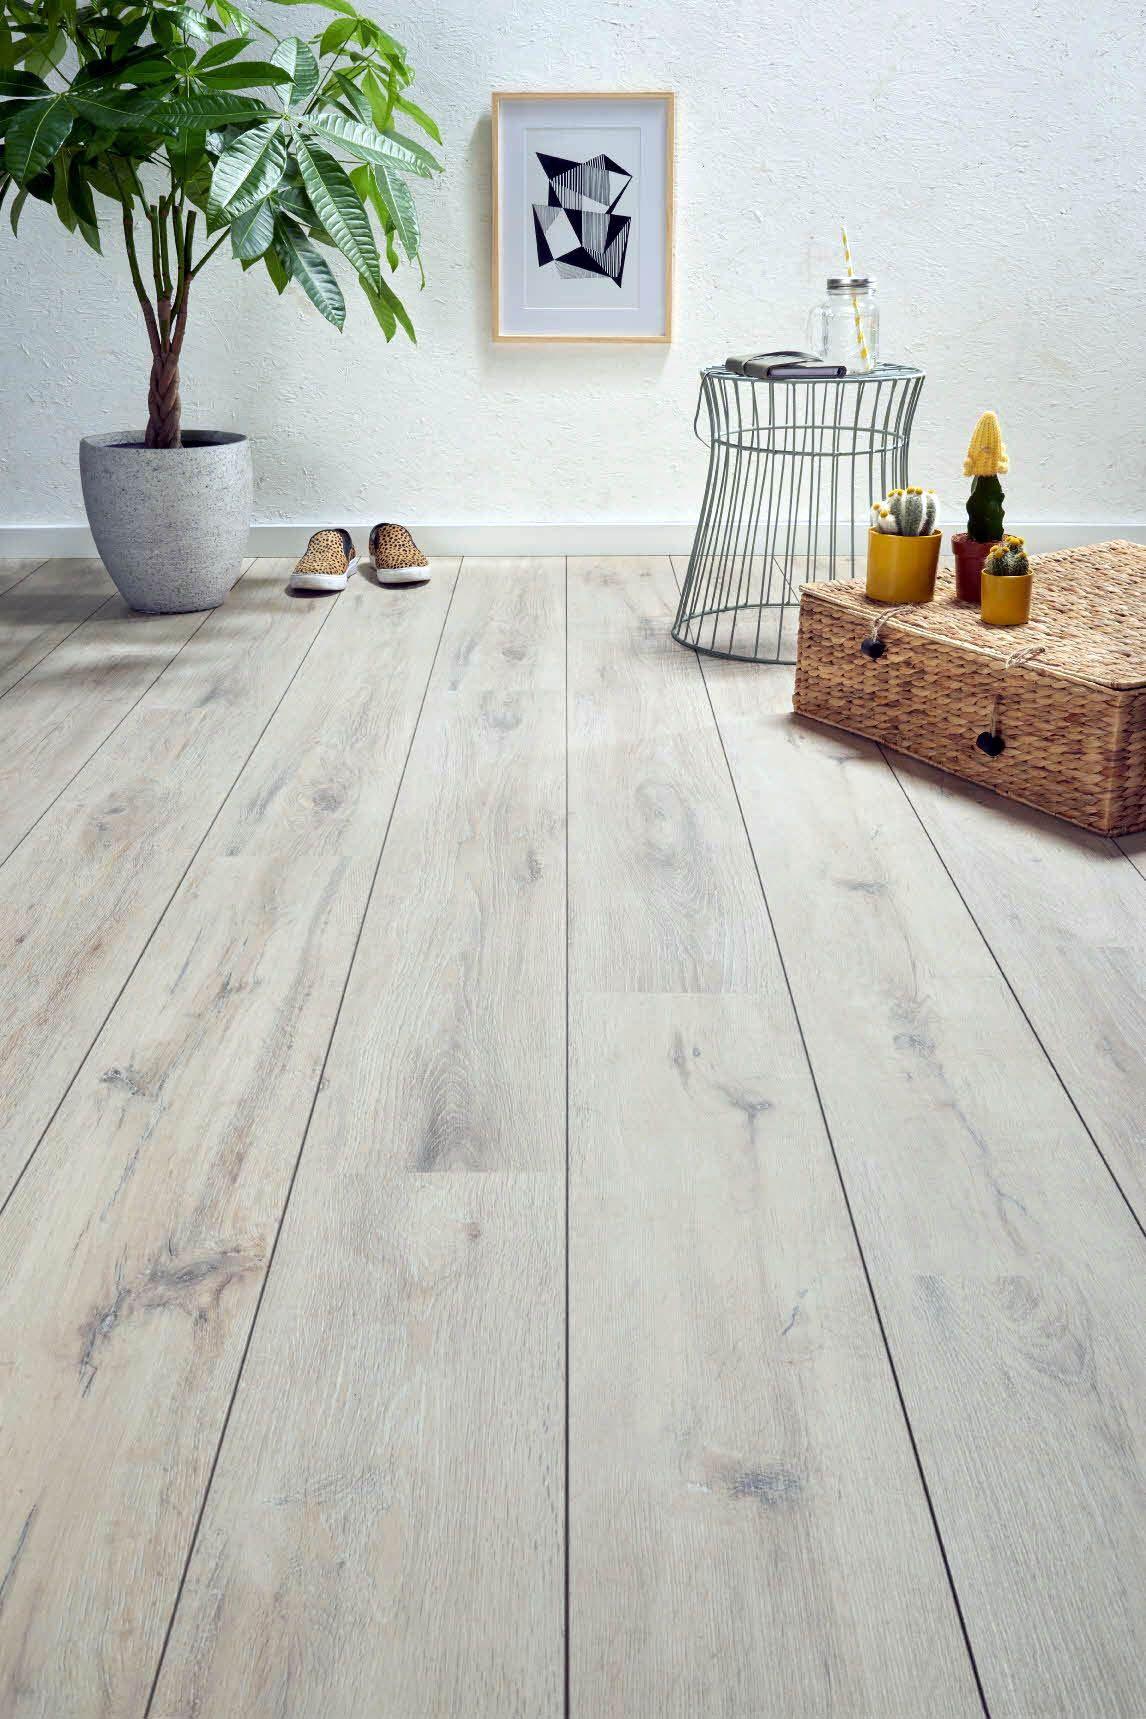 Stylish Ways to Decorate laminate wood flooring cost